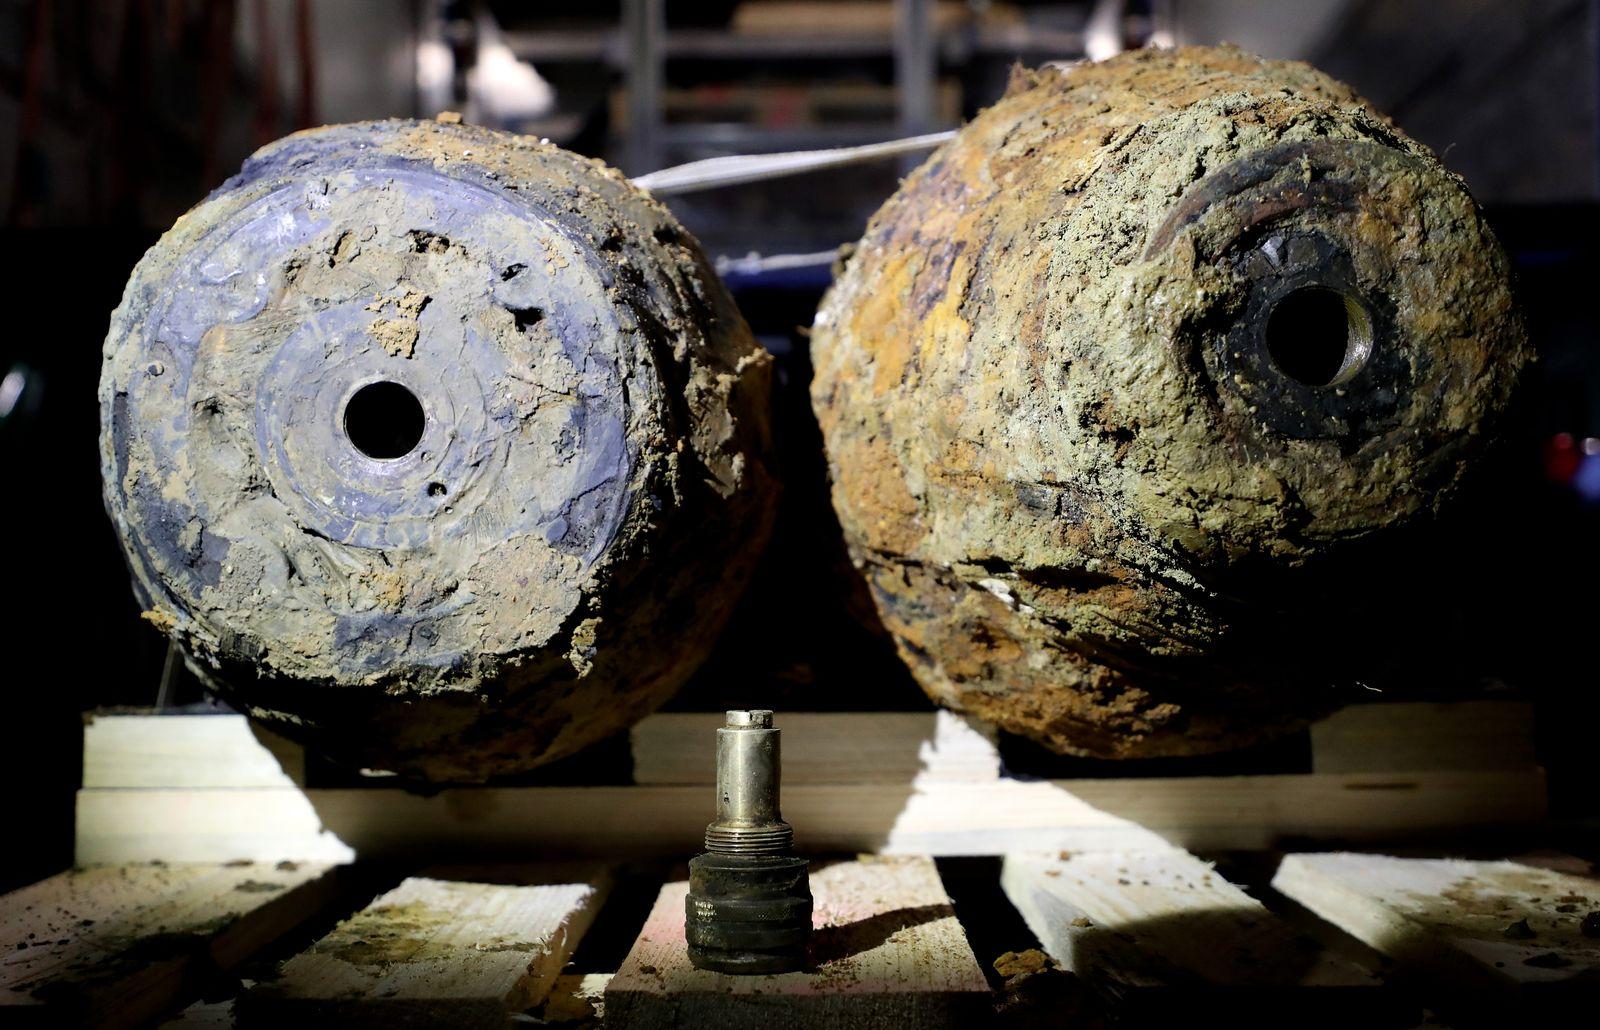 Bomb disposal of a World War II aerial bomb found in Dortmund, Germany - 12 Jan 2020